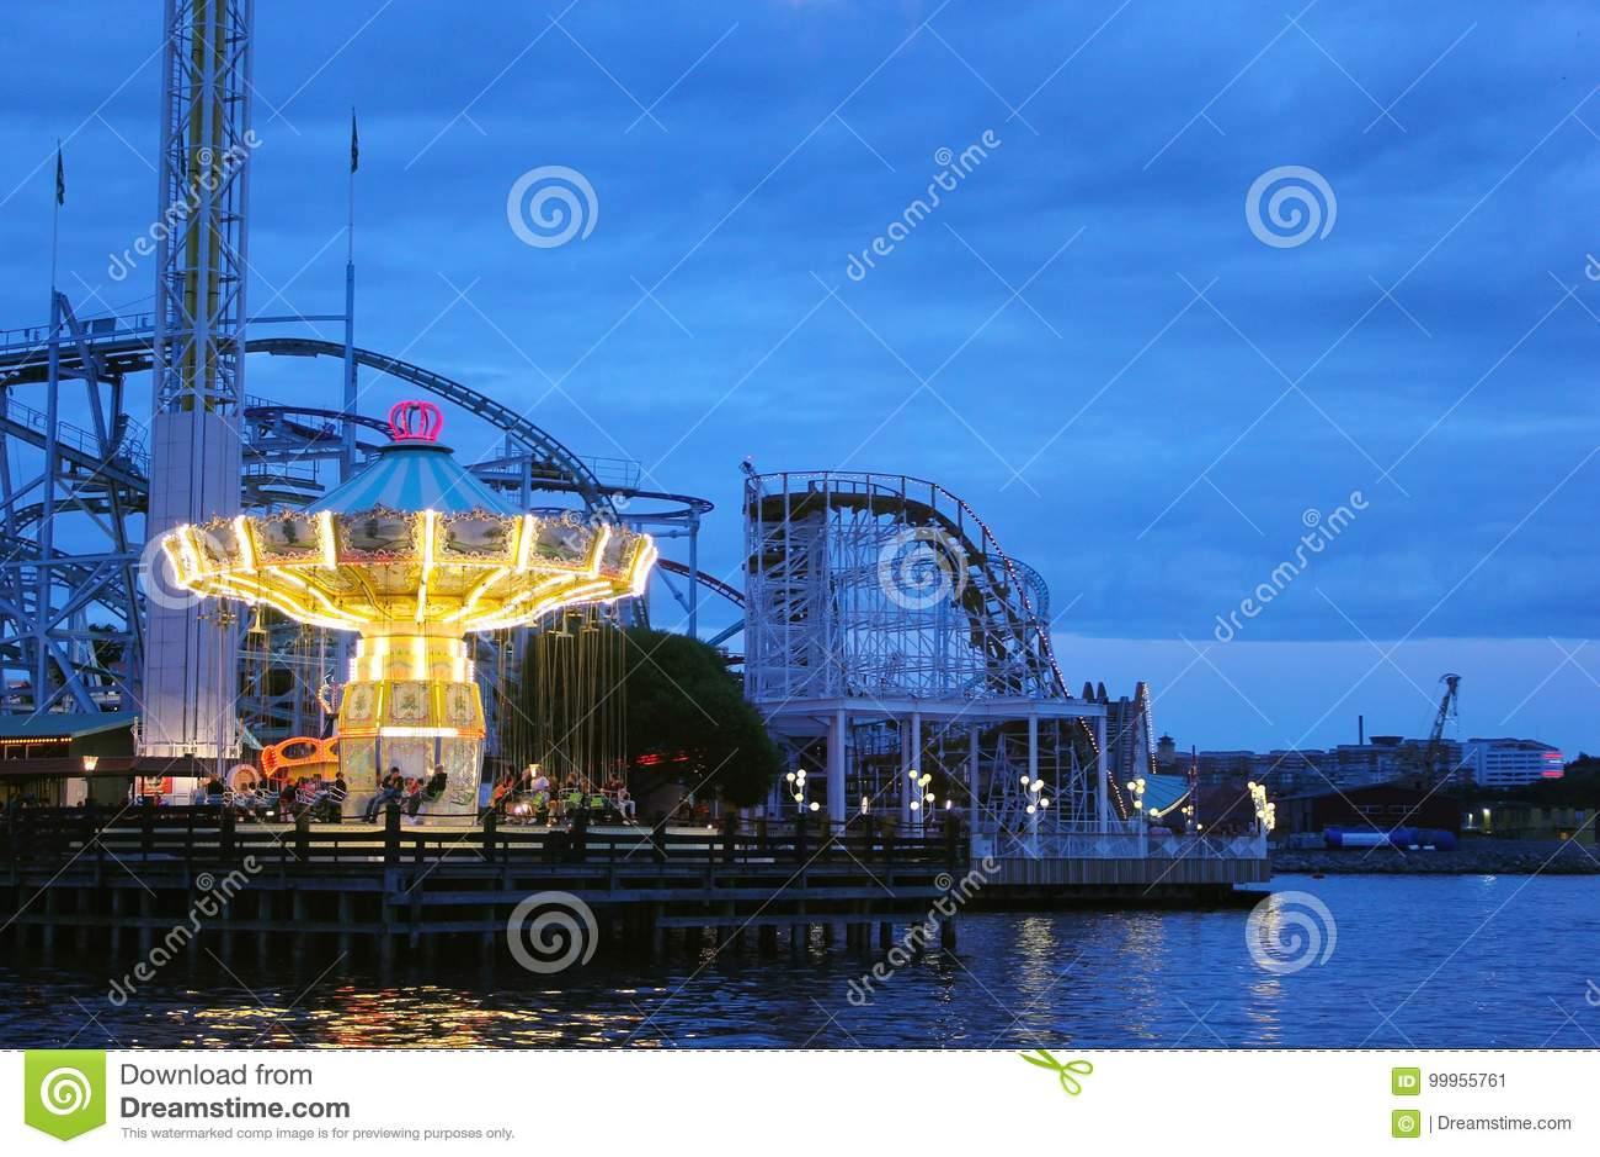 Fair at night in stockholm